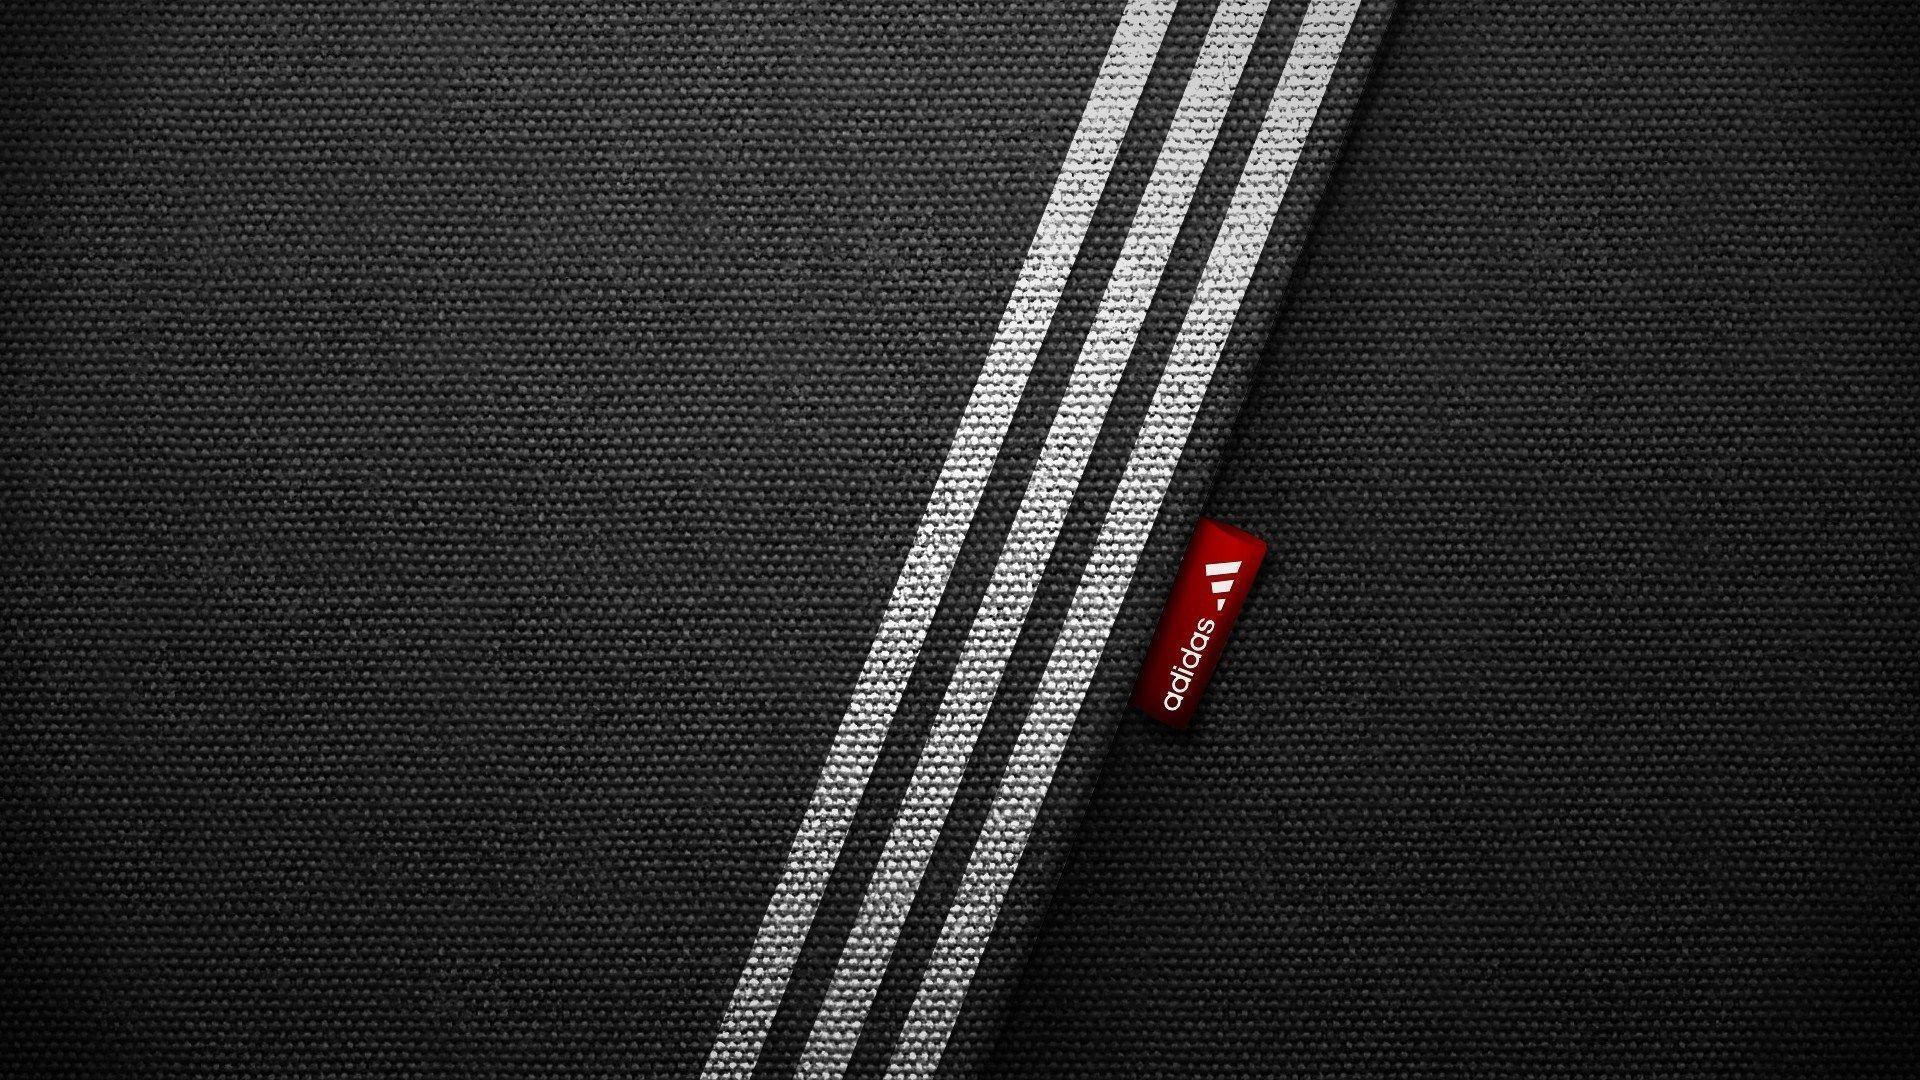 Adidas Logo Wallpapers 2015 1920x1080